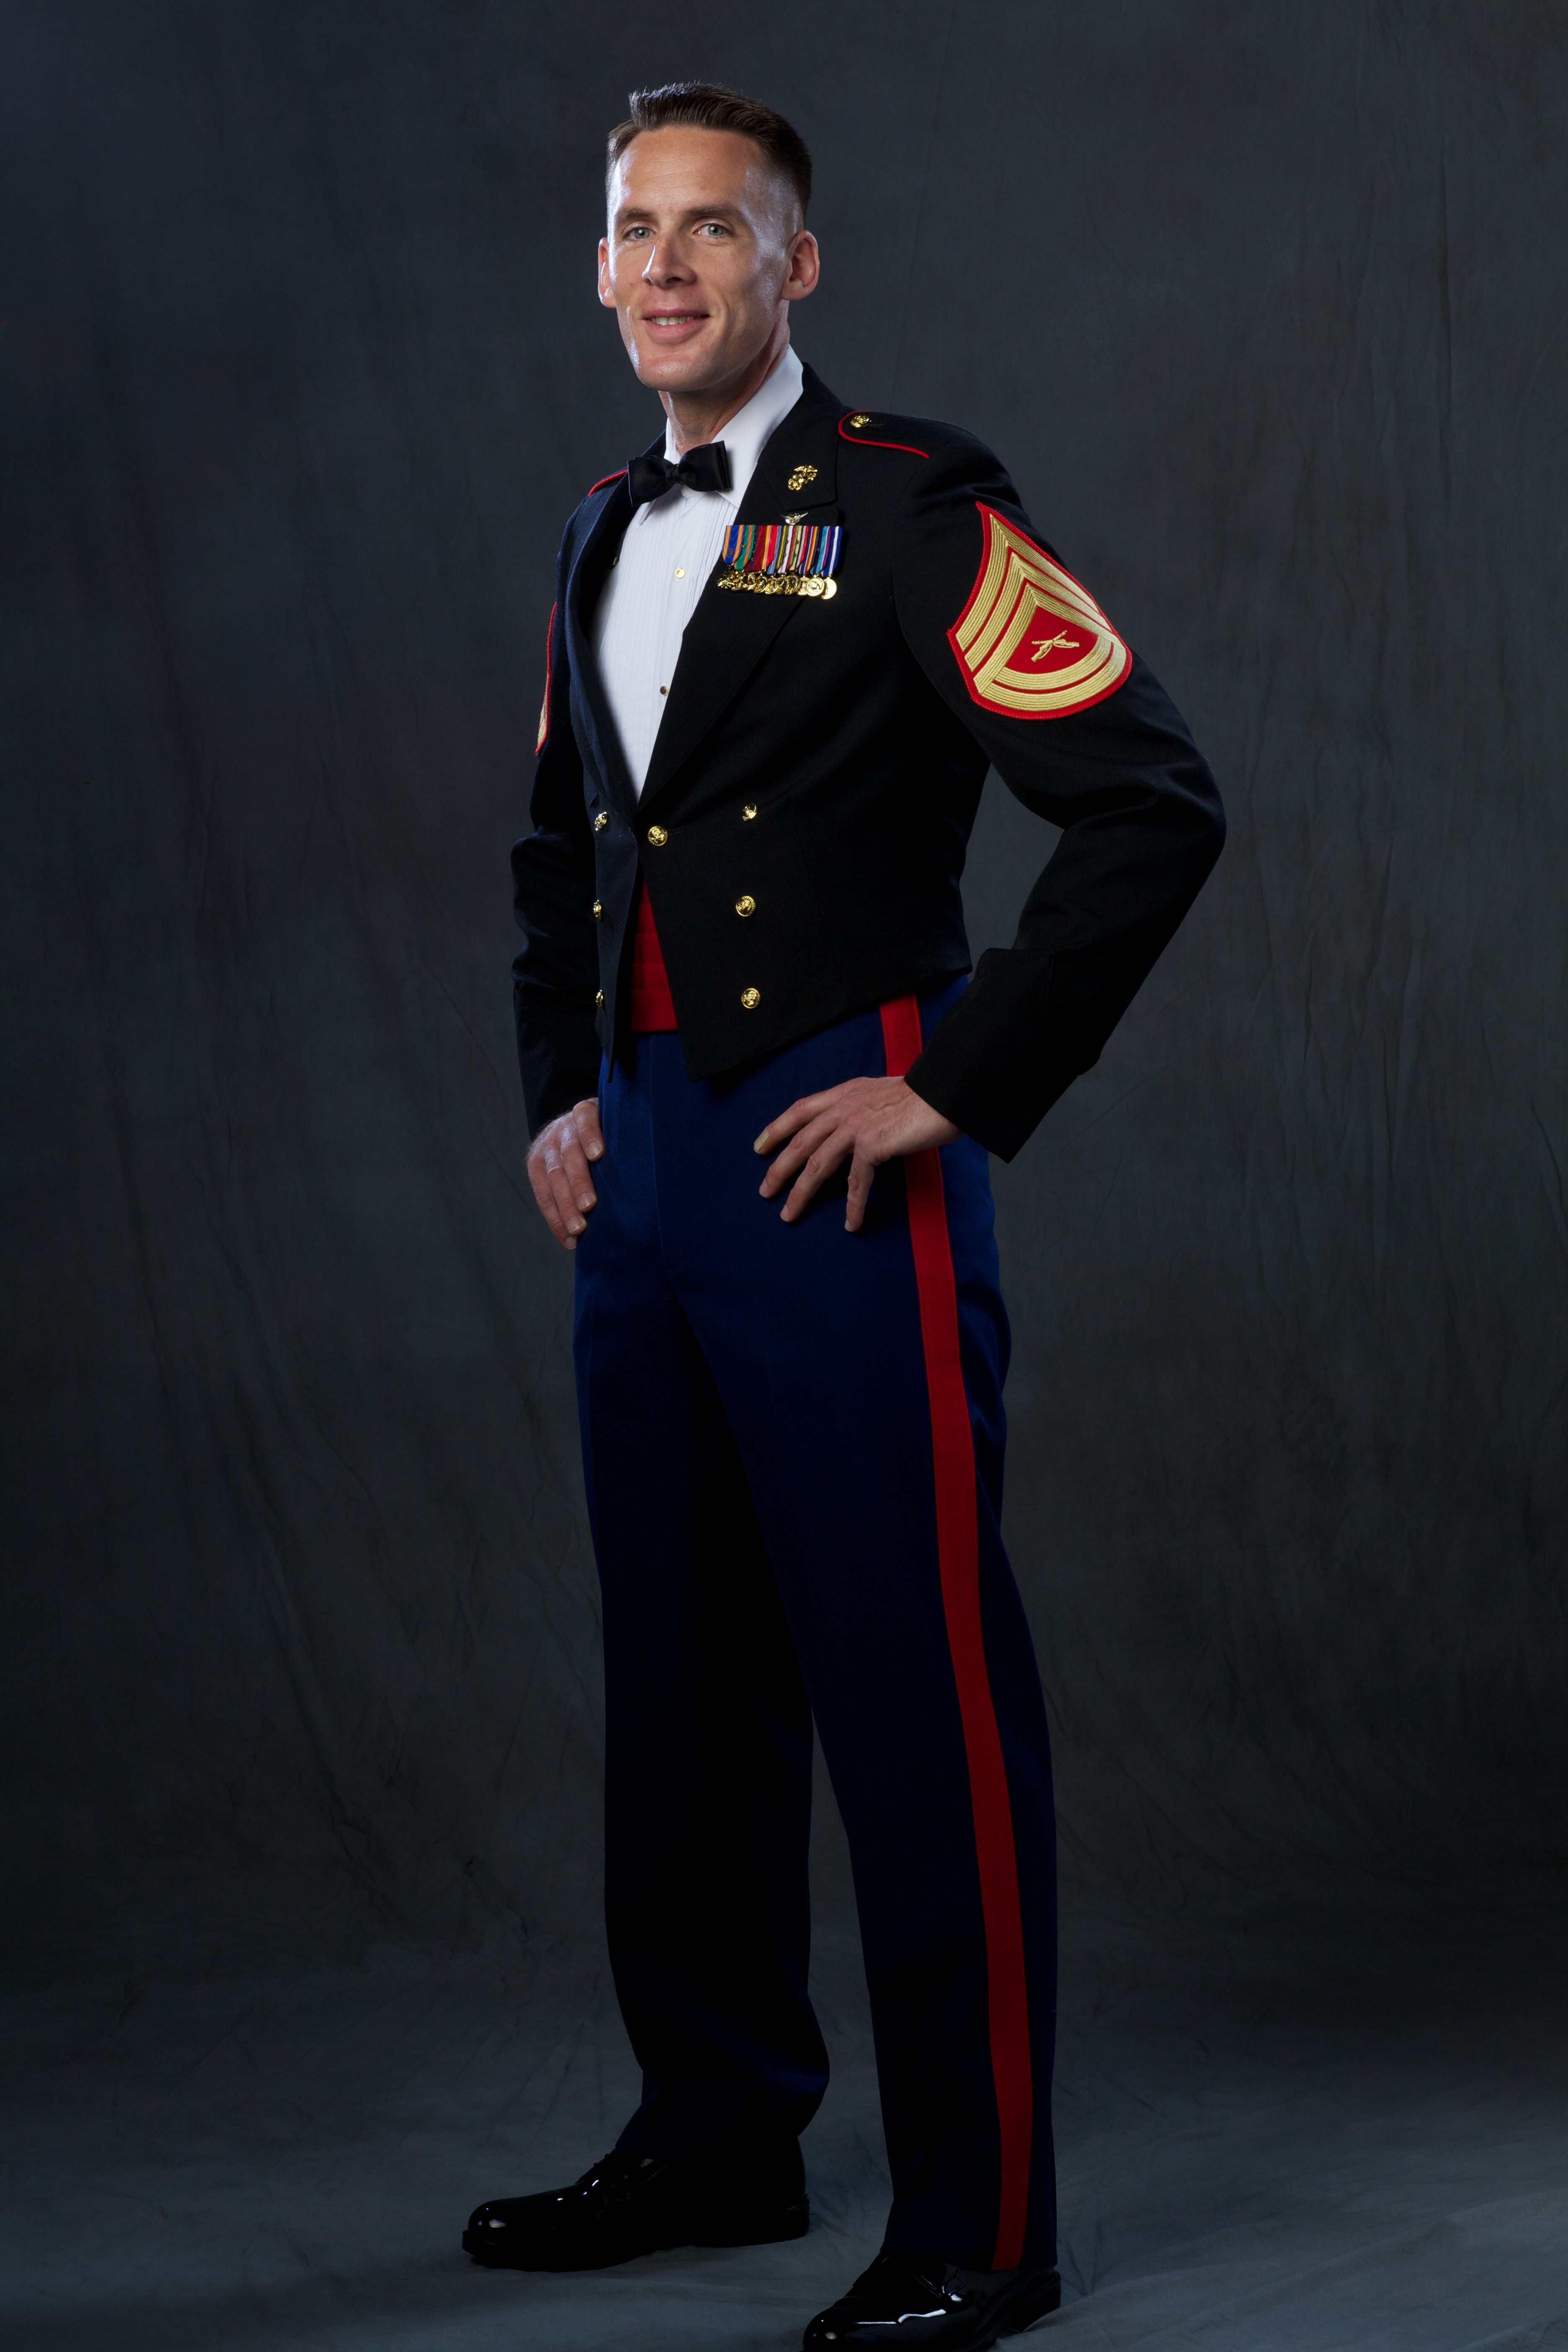 Marine evening dress uniforms